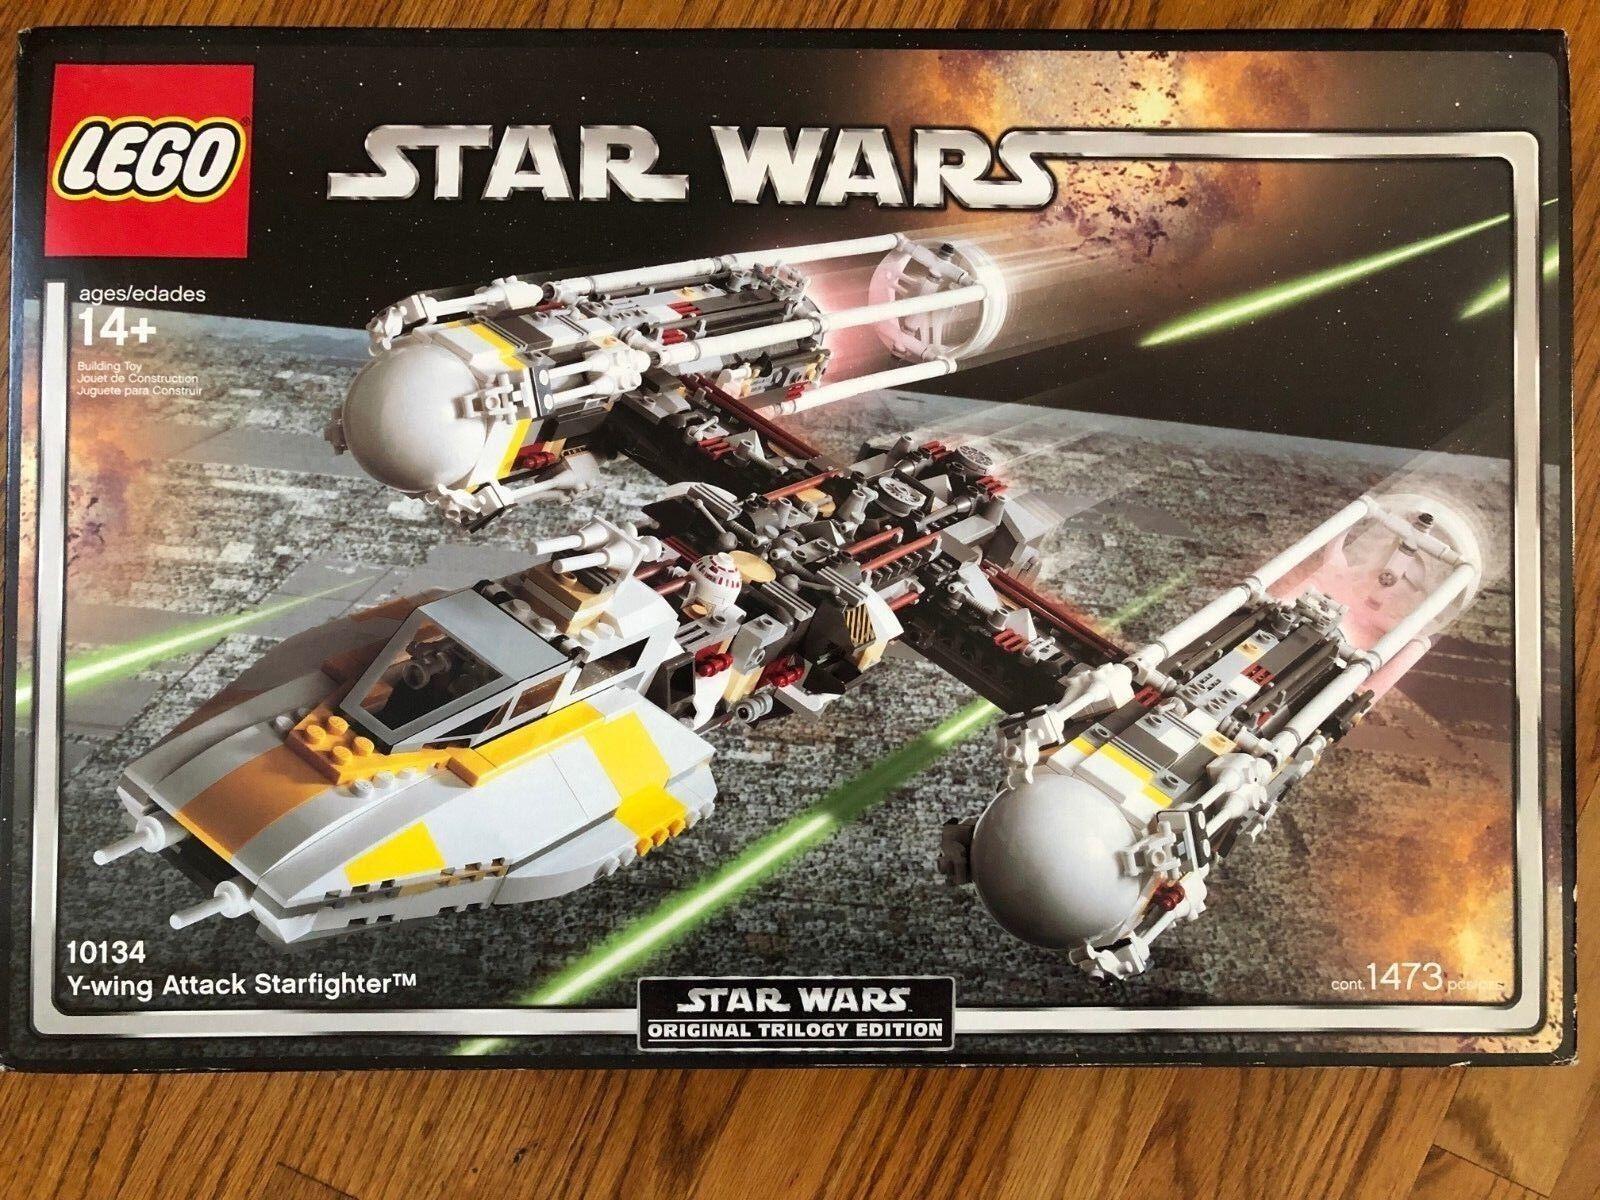 LEGO Star Wars Original Trilogy Edition Y-Wing set   10134 BRAND NEW Sealed